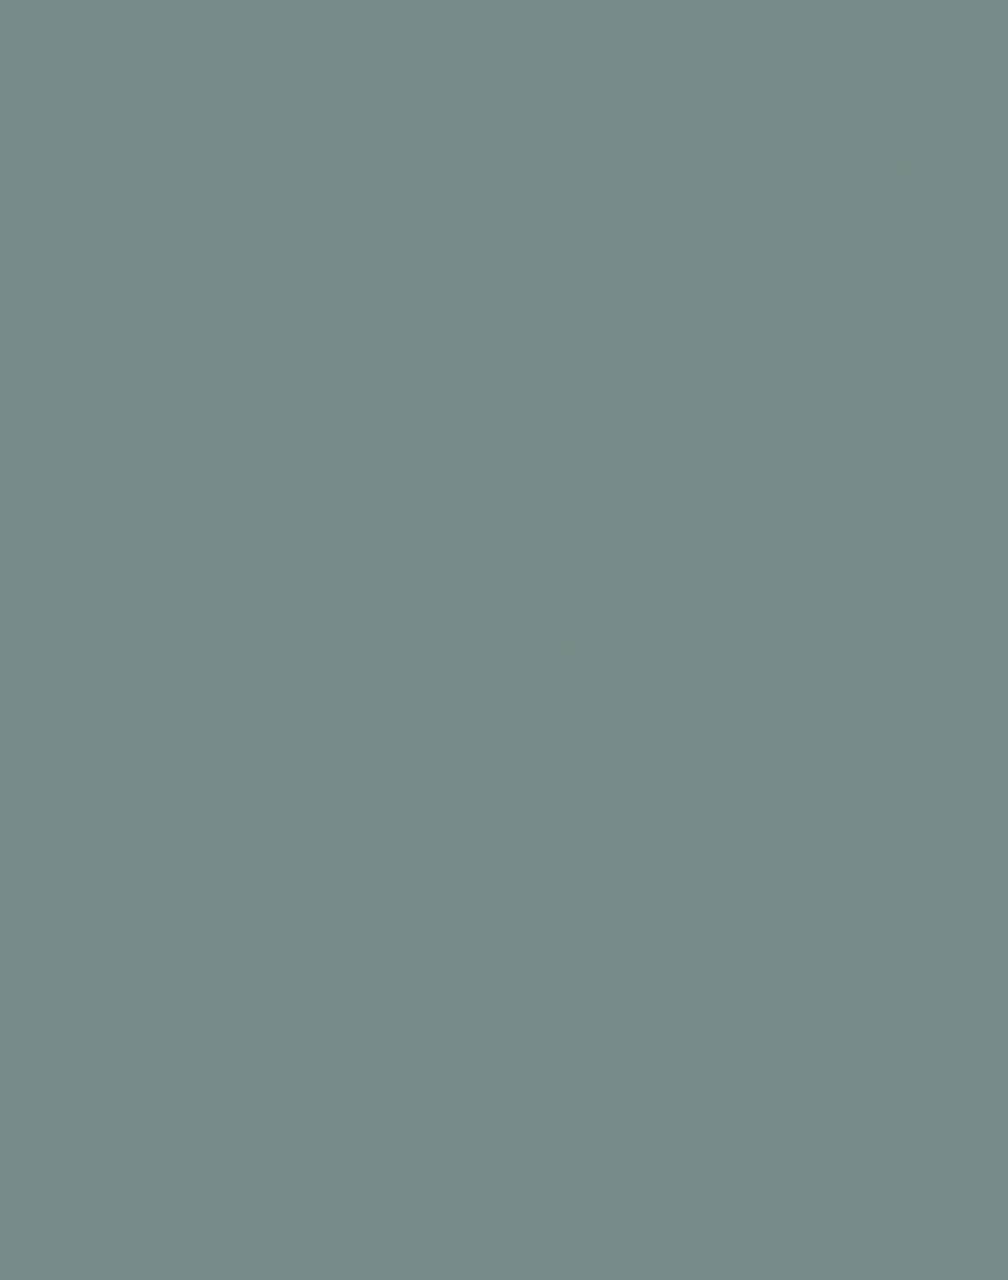 K097 Dusk Blue (MF PB sample)